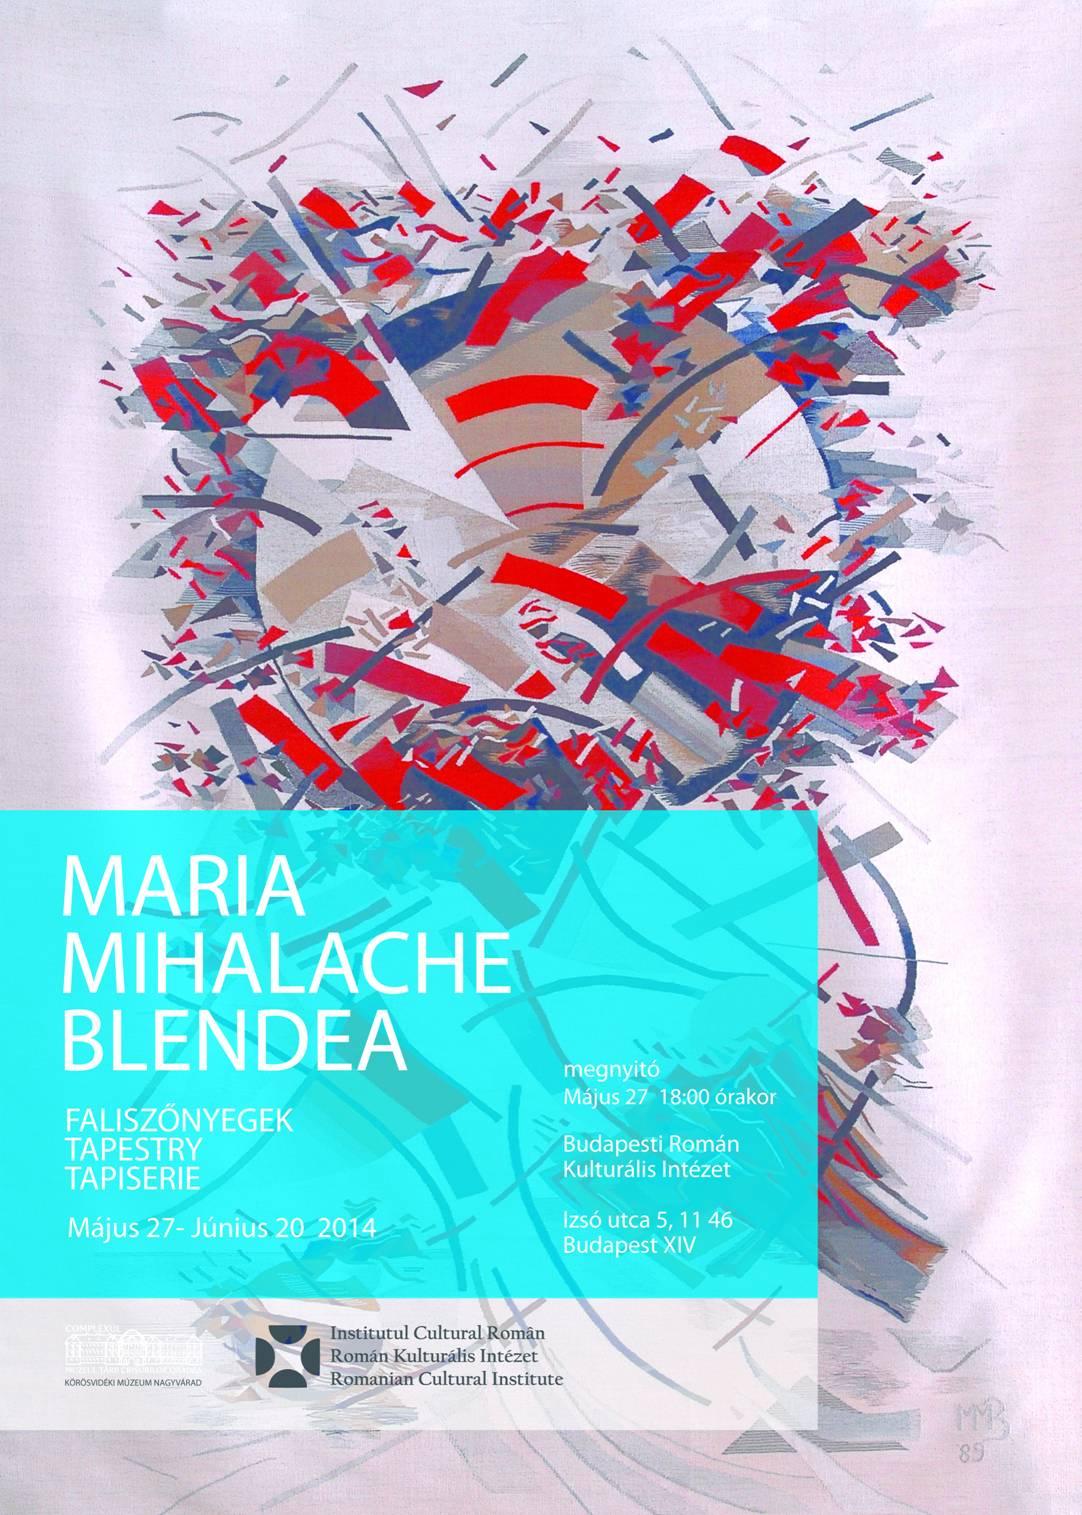 Maria Mihalache Blendea @ ICR Budapesta